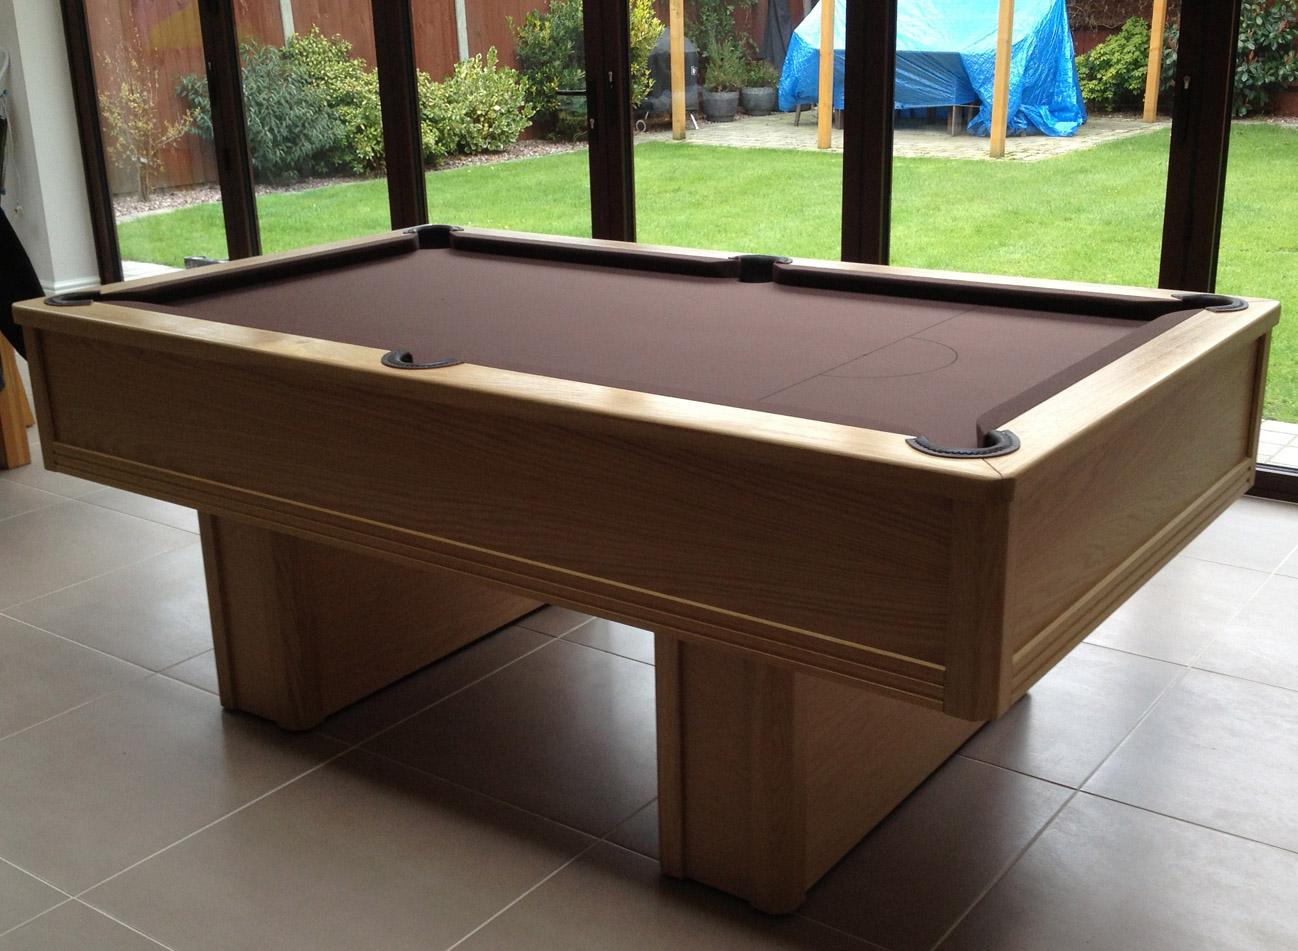 Emperor UK Pool Table Snooker Pool Table Company Ltd - British pool table